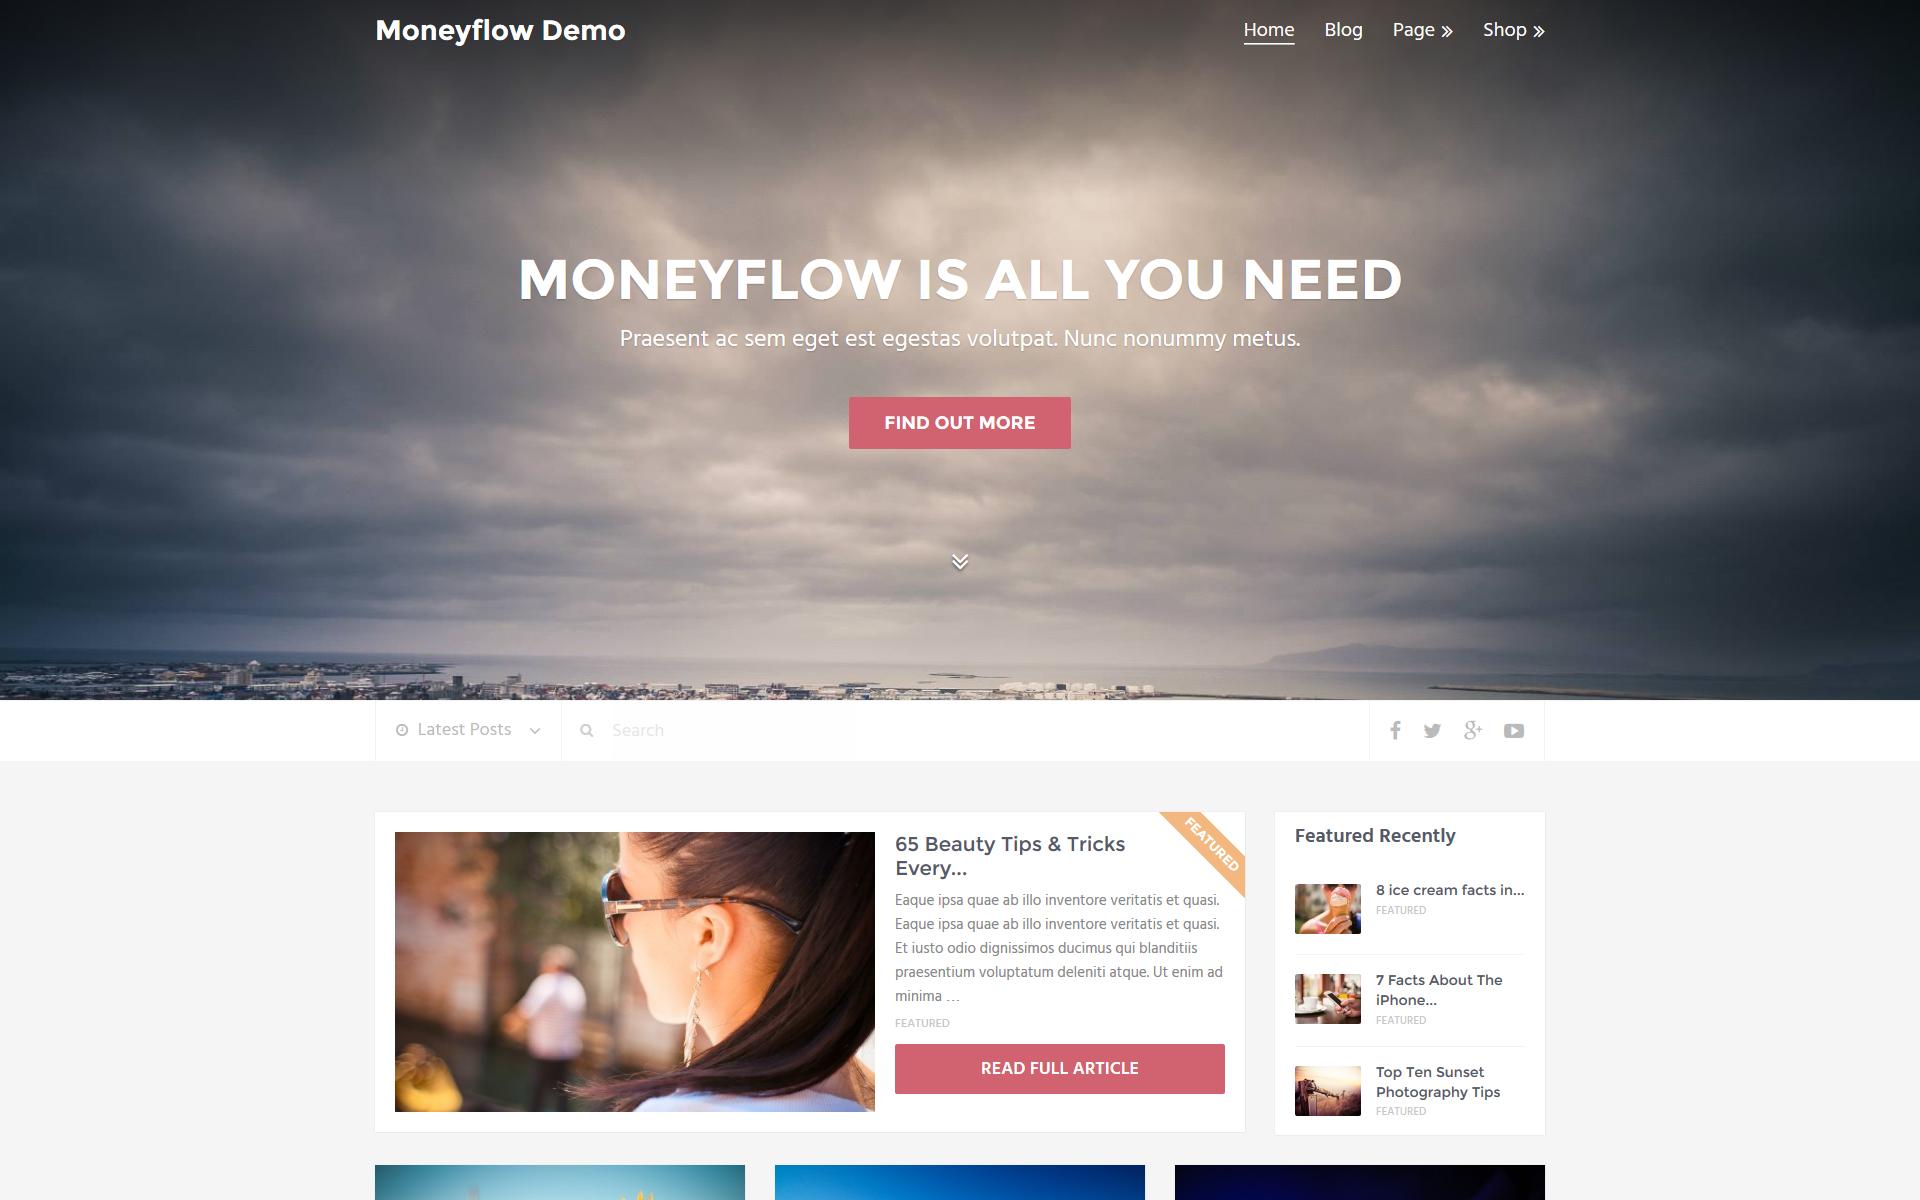 moneyflow home